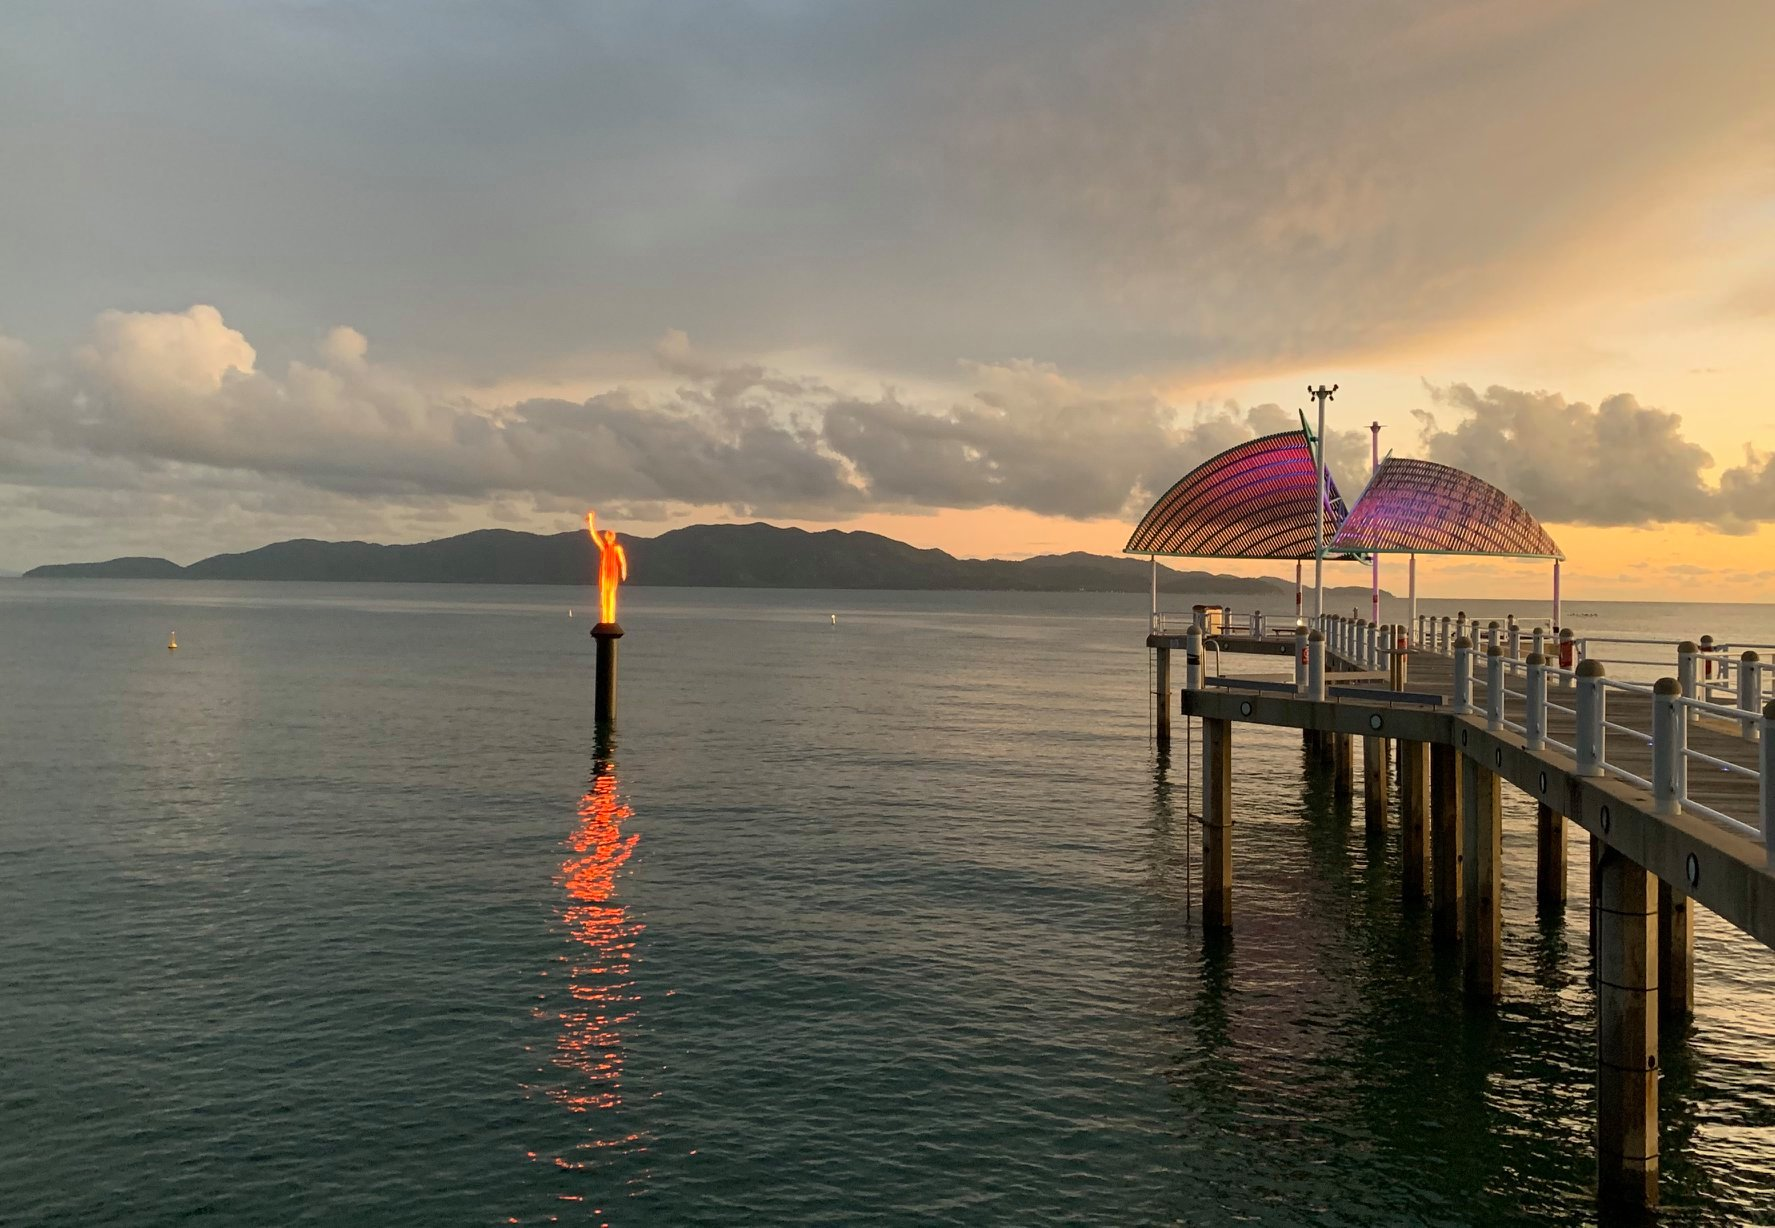 moua-australia-podvodnie-skulpturi